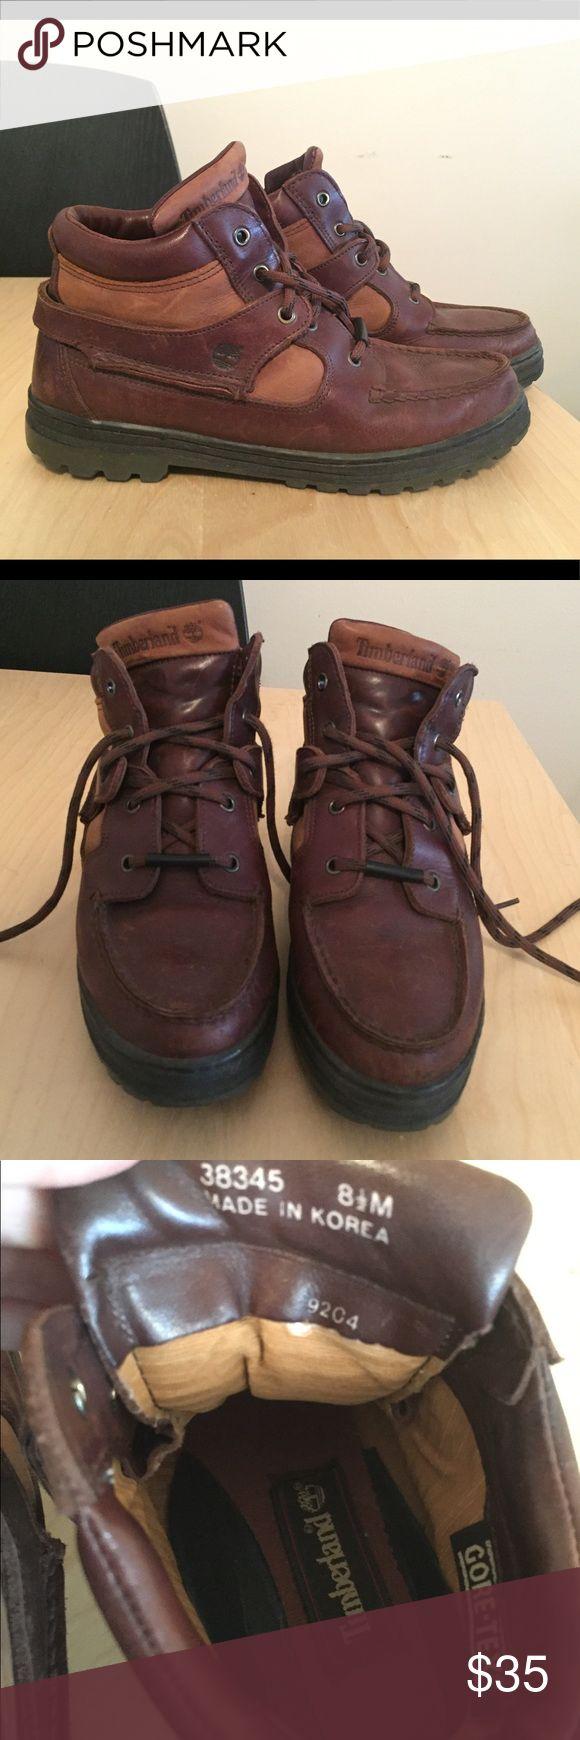 Timberland 38345 Gore Tex women's 8.5 hiking boots Timberland 38345 Gore Tex women's 8.5 hiking boots. Worn once. Make an offer! Timberland Shoes Winter & Rain Boots